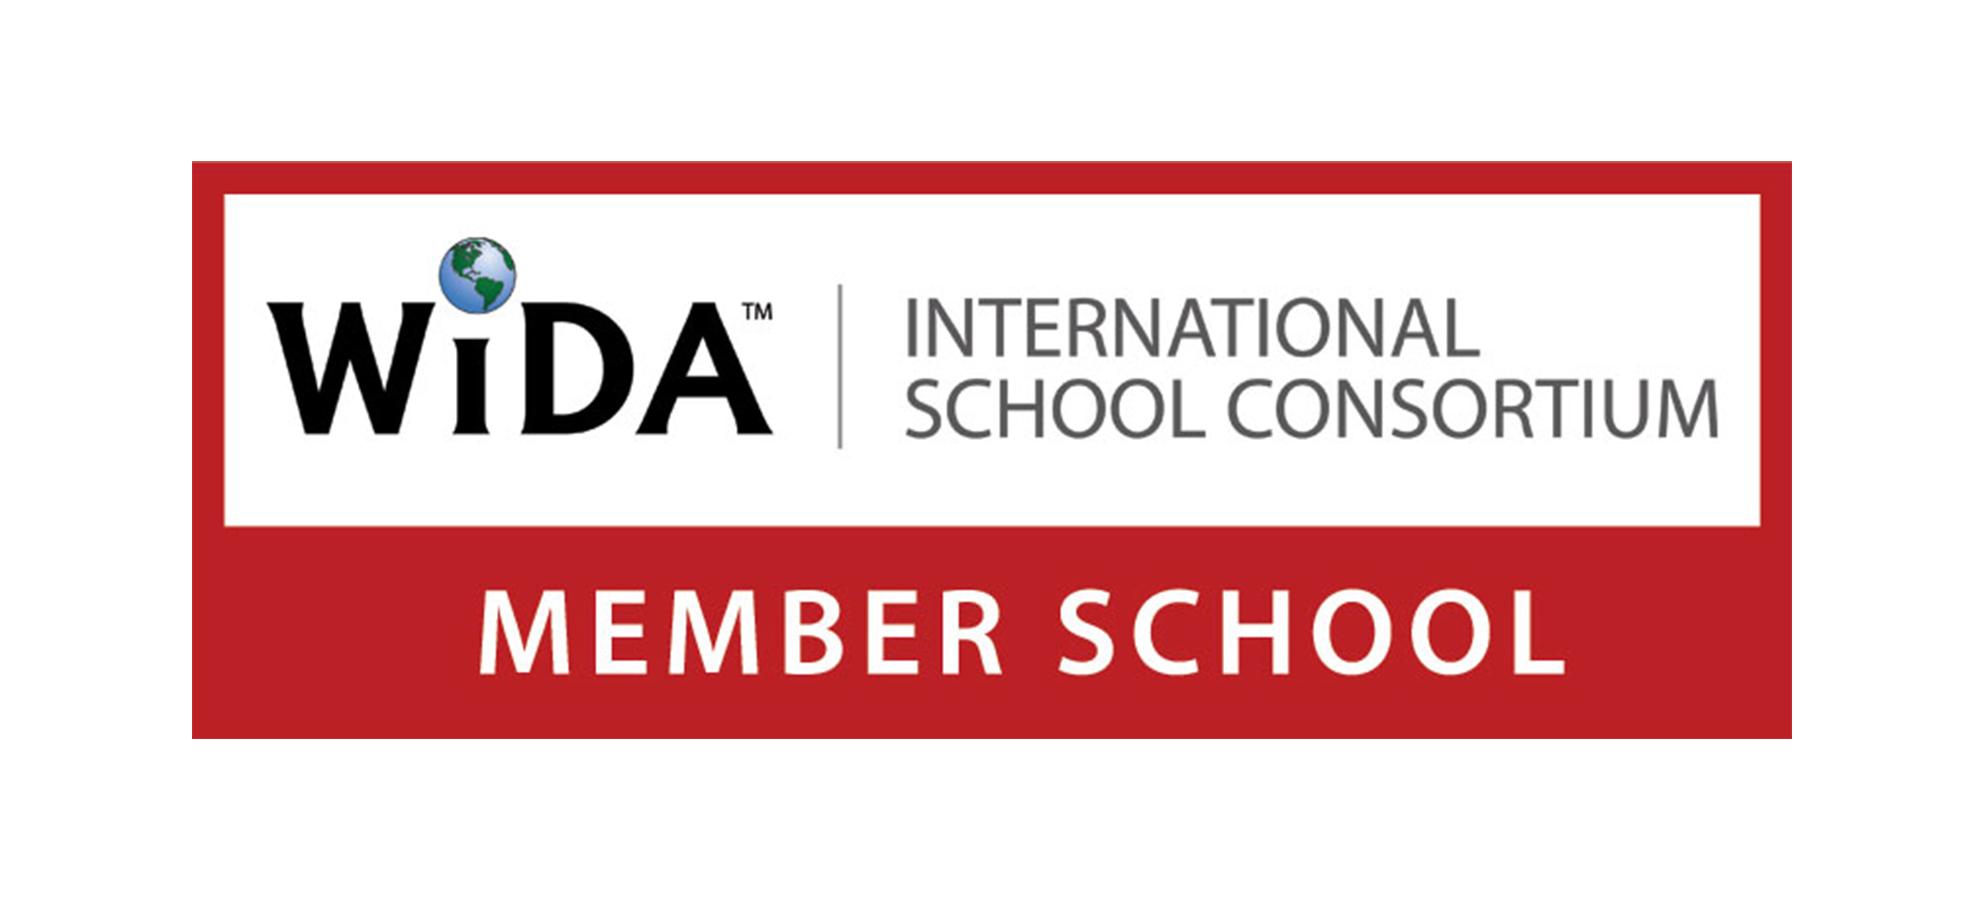 WIDA Member School.jpg